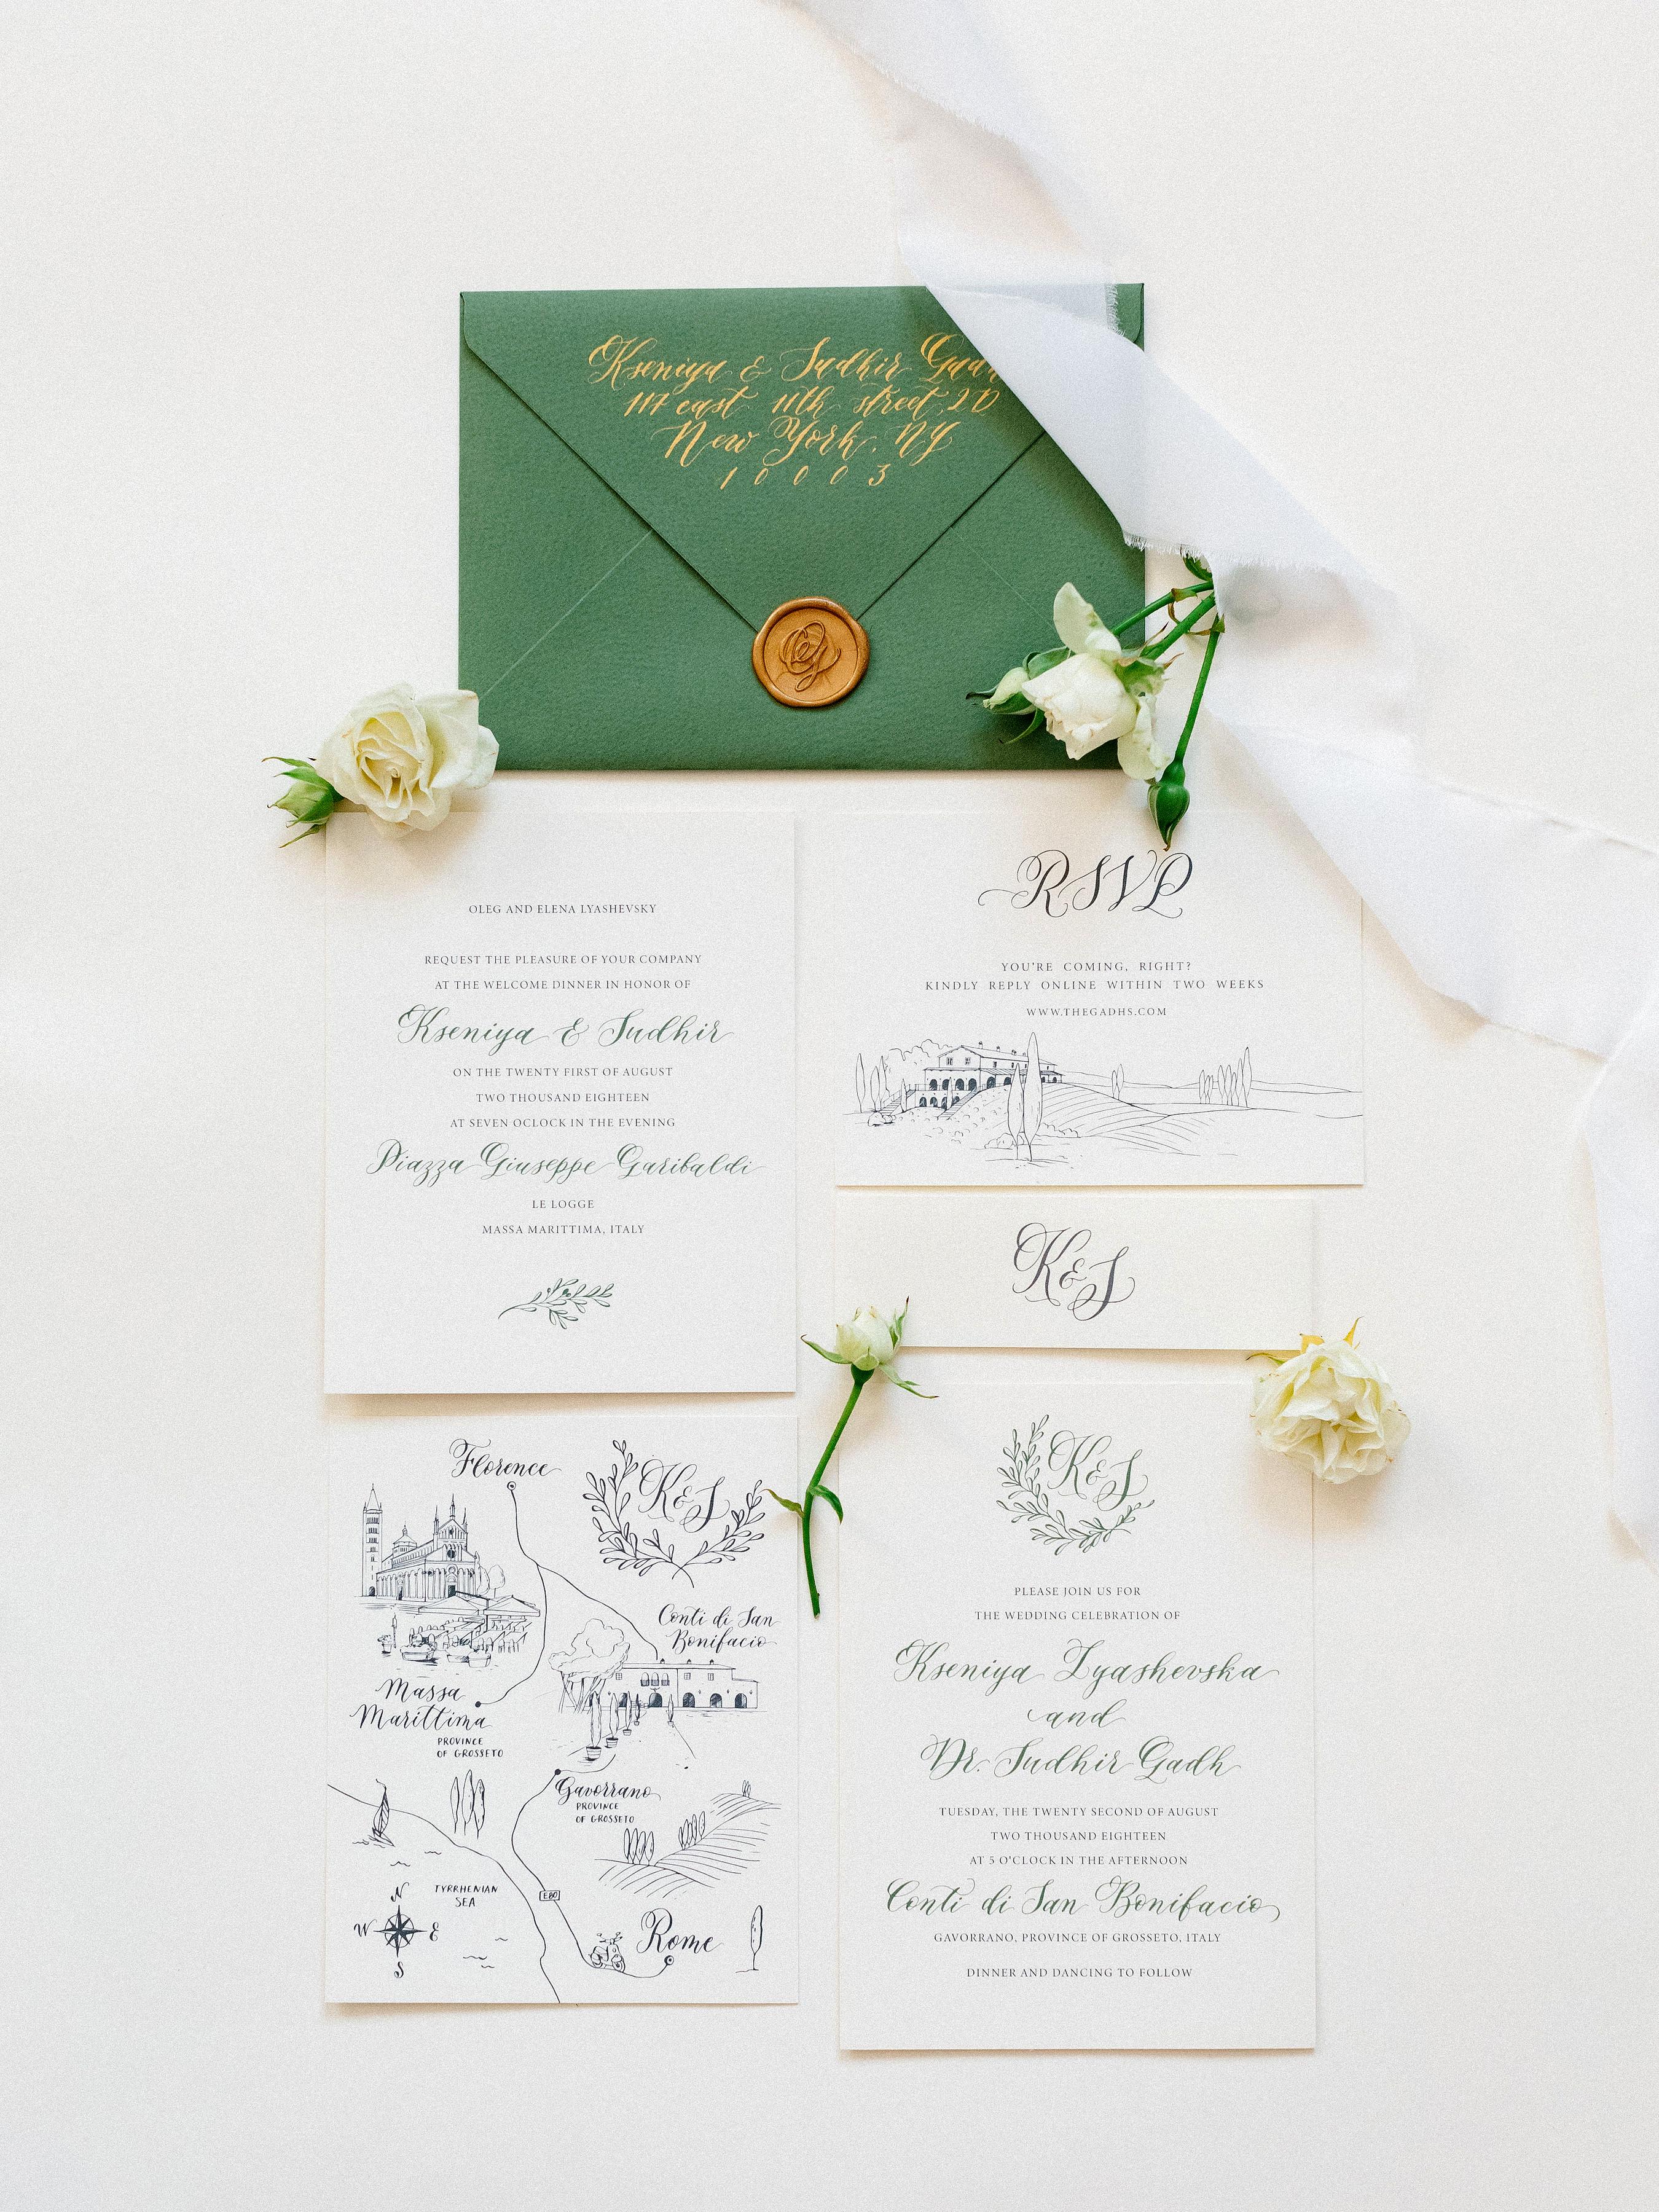 kseniya sadhir wedding invitation stationary suite